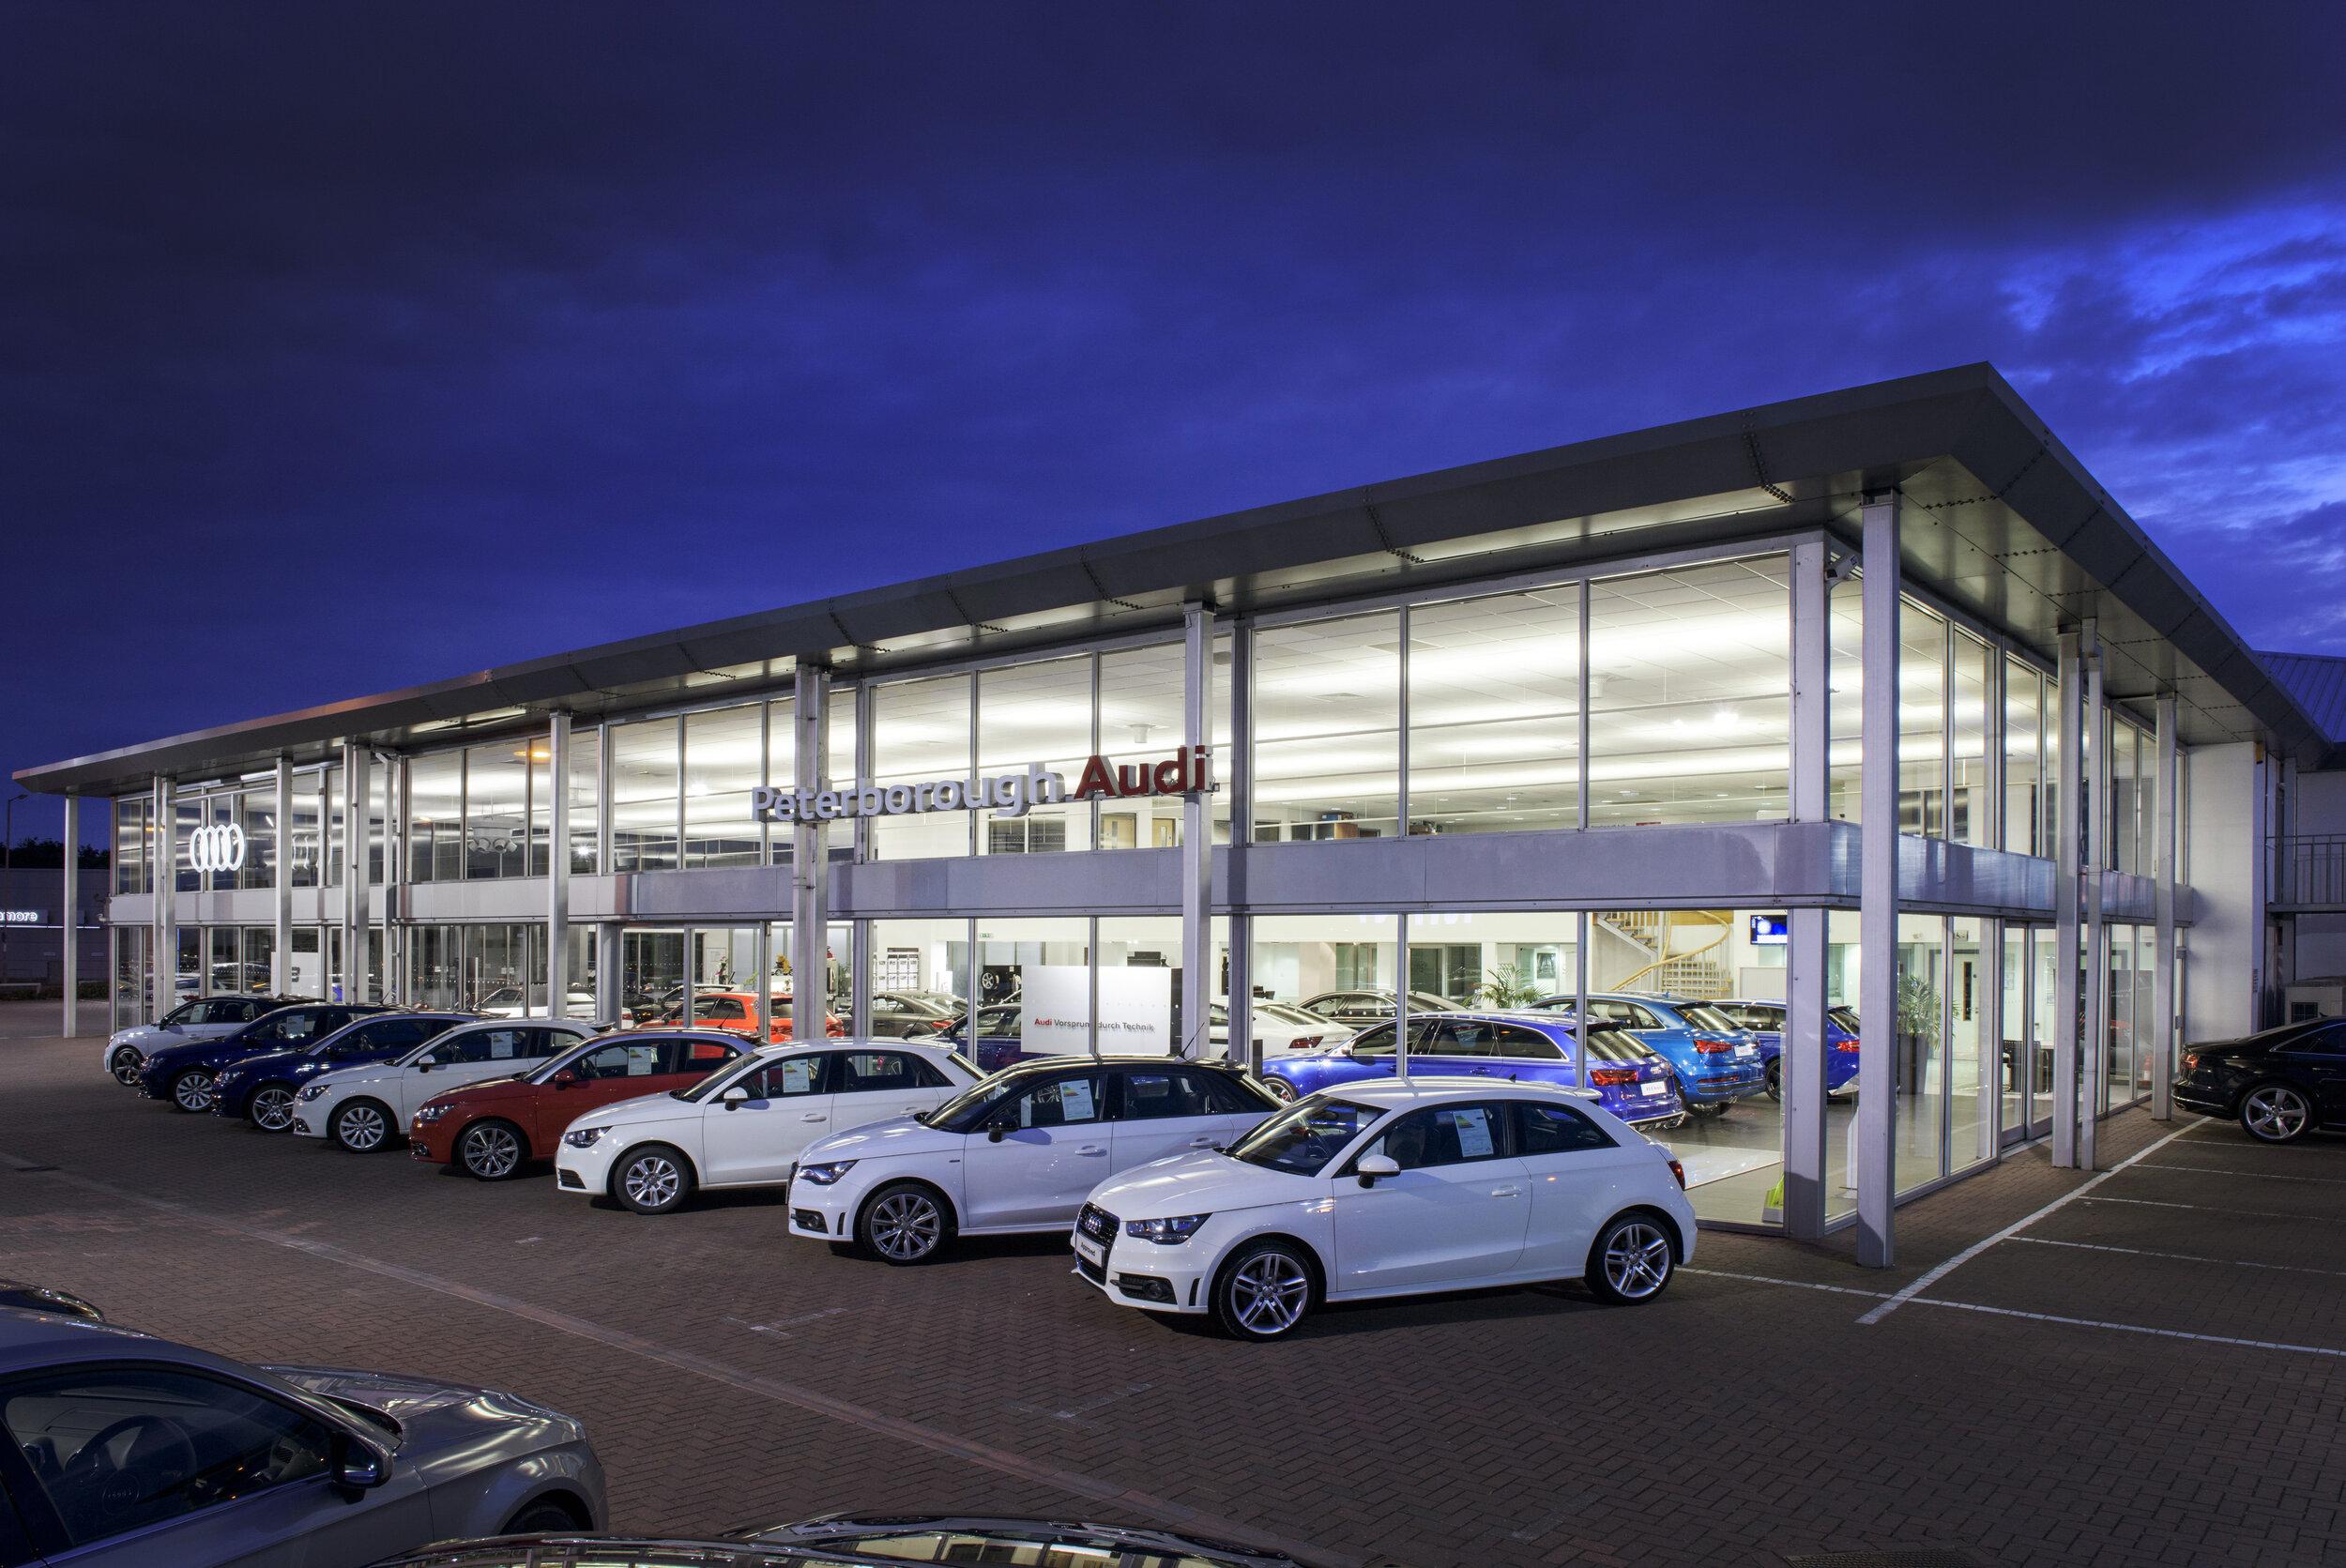 Audi Dealership - Location: Peterborough, CambridgeshireValue: £50,000.00Sector: New Build Commercial BuildingProducts: Aluminium curtain walling and sliding doors